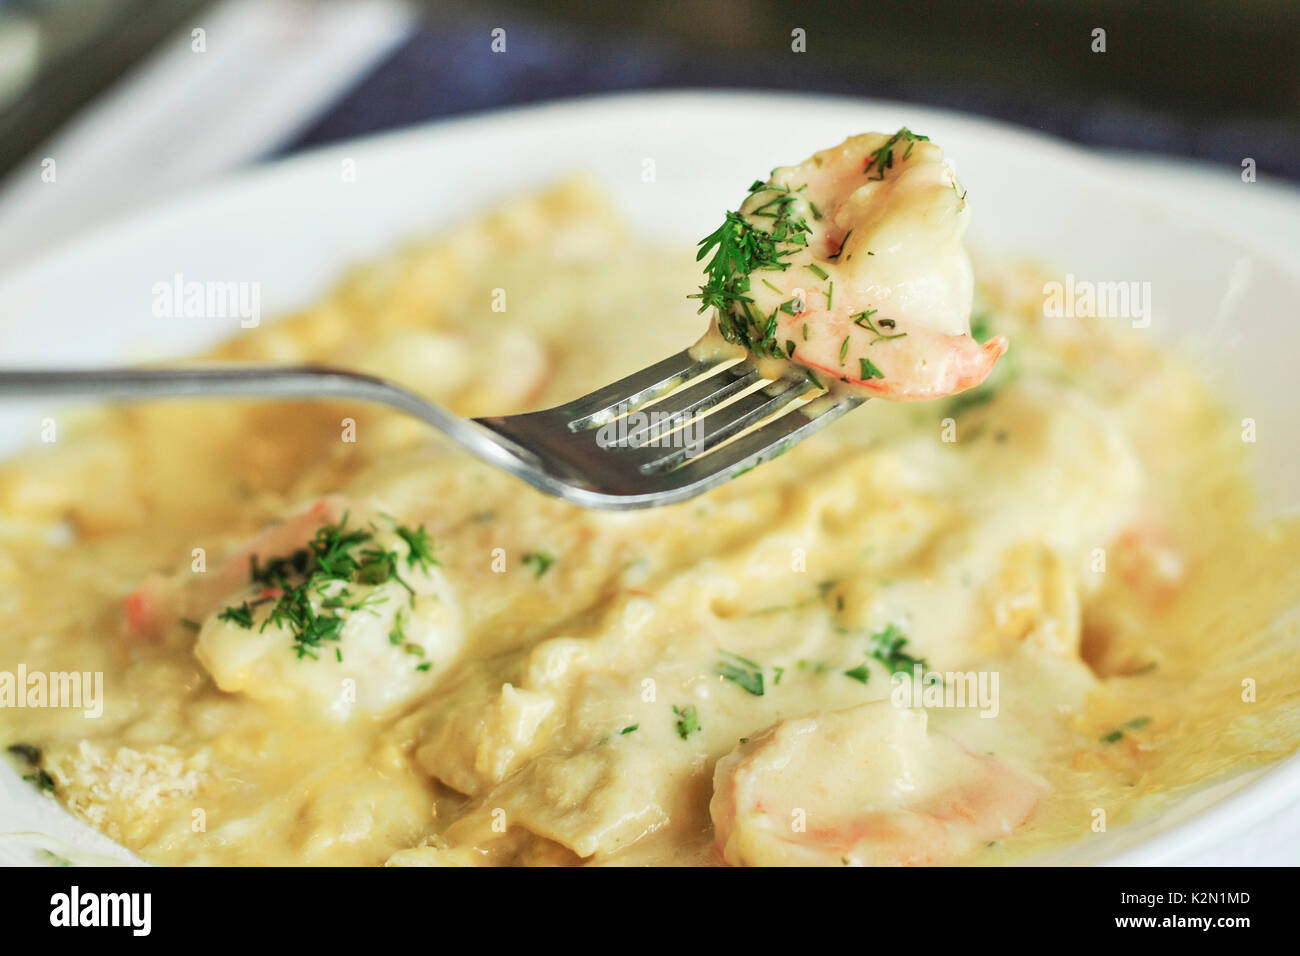 Cuisine of ecuador stock photos cuisine of ecuador stock images shrimp lasagna whit huancaina sauce peruvian restaurant guayaquil ecuador stock image forumfinder Gallery